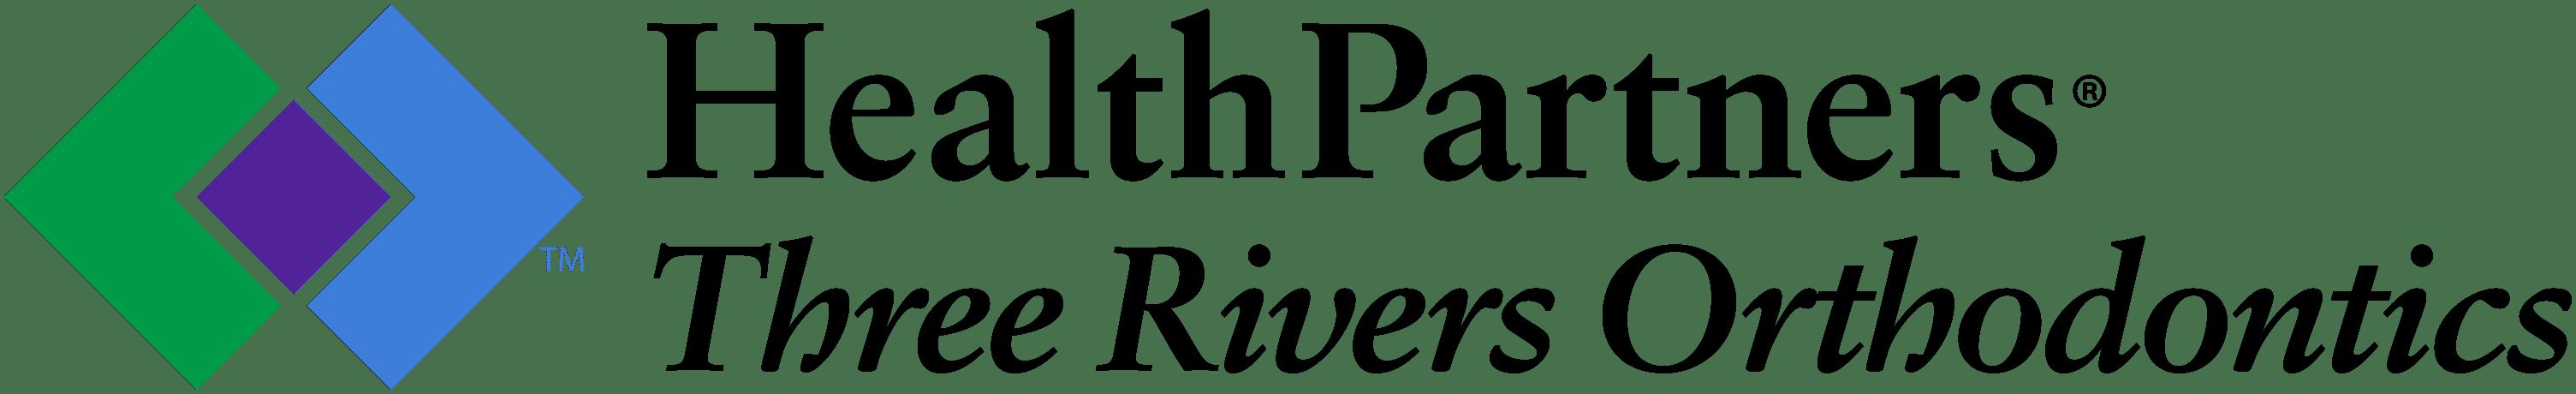 Health Partners - Three Rivers Orthodontics